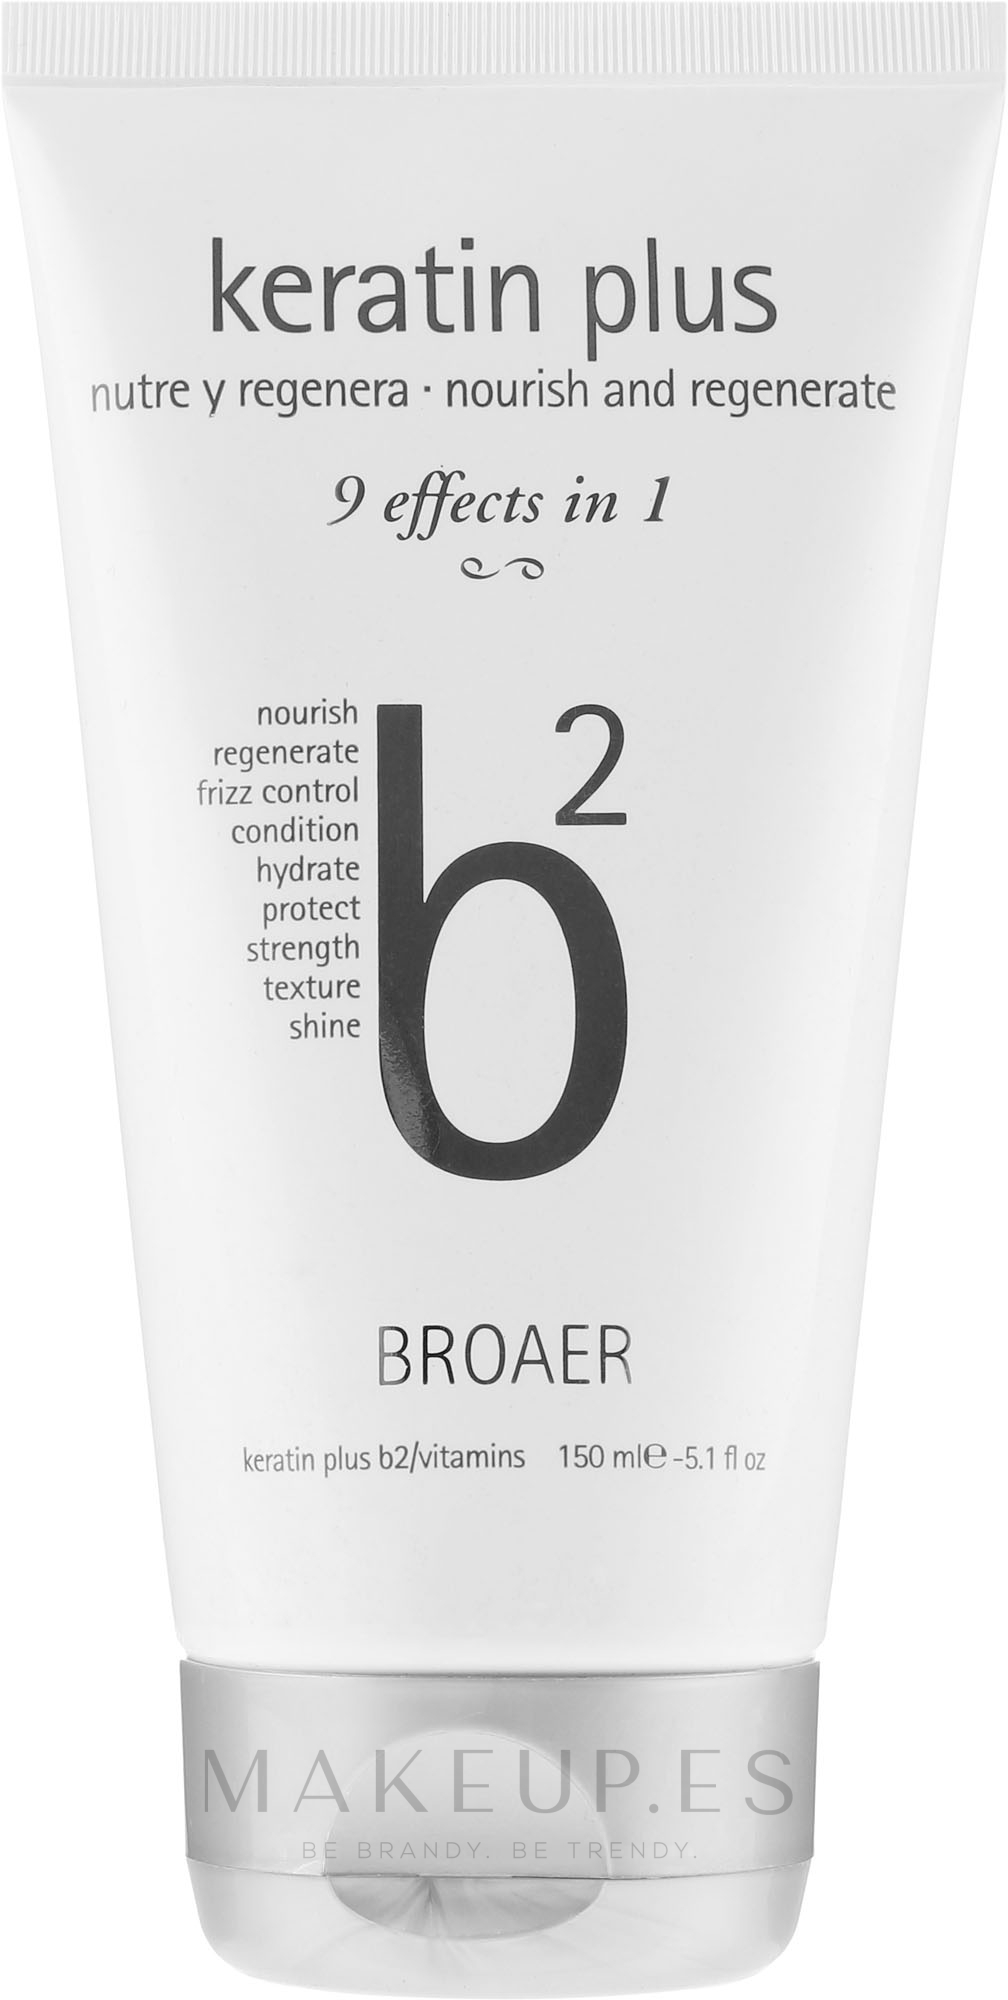 Champú nutritivo con queratina y vitaminas - Broaer B2 Keratin Plus Nourish And Regenerate Shampoo — imagen 150 ml